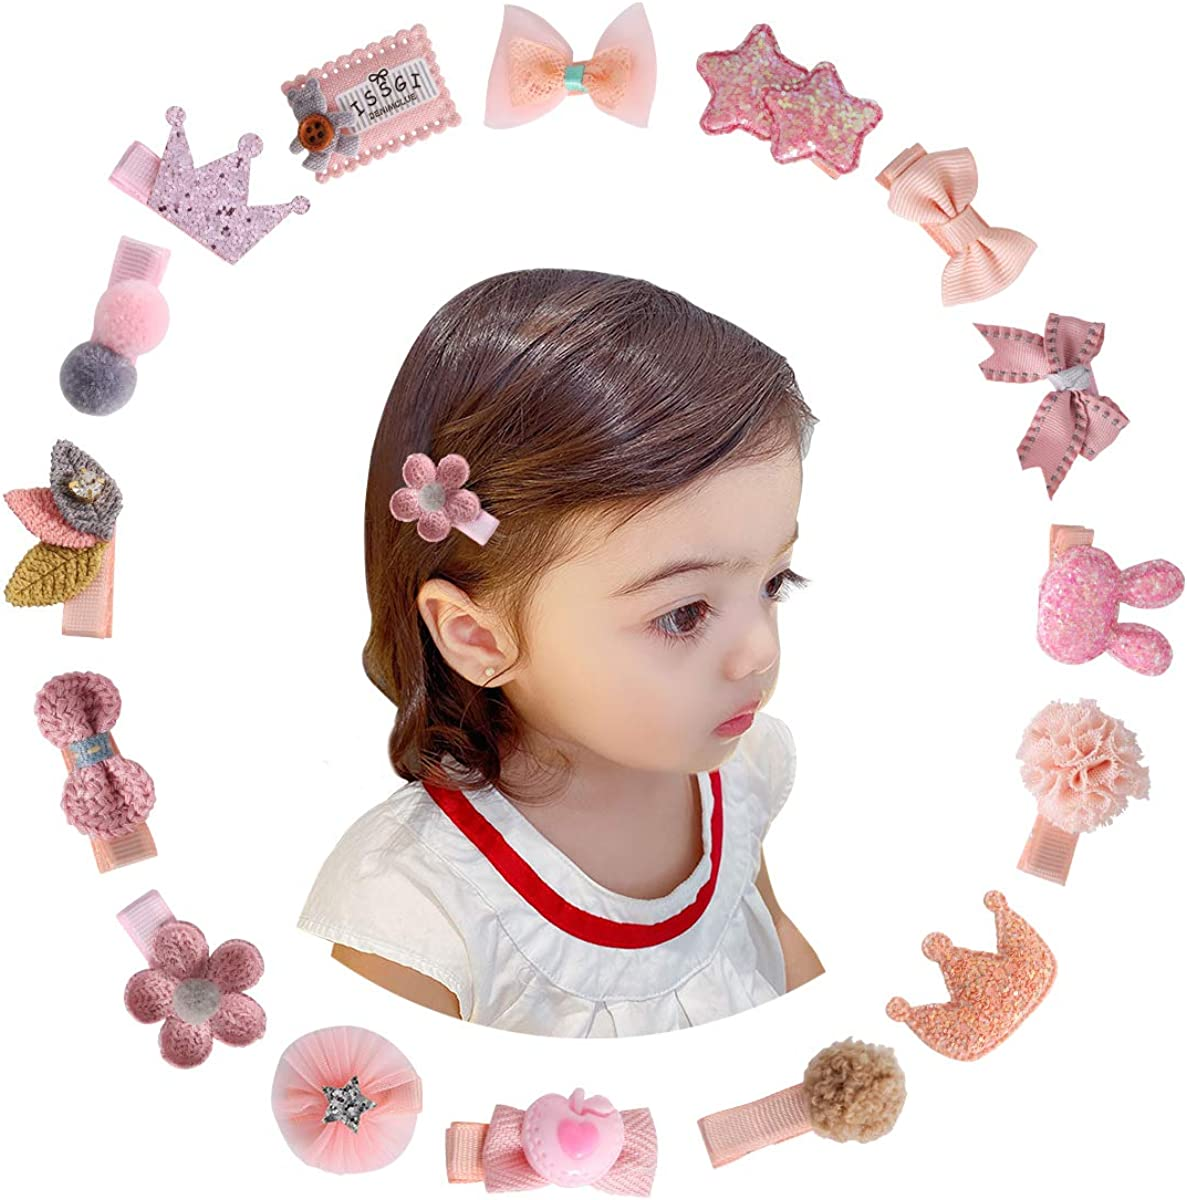 Dawoowoo 16 Pieces Baby Girls Hiar Clips Cute Hiar Bows Flower Hiar Clips Barrettes for Infant Toddlers Kids Hair Accessories